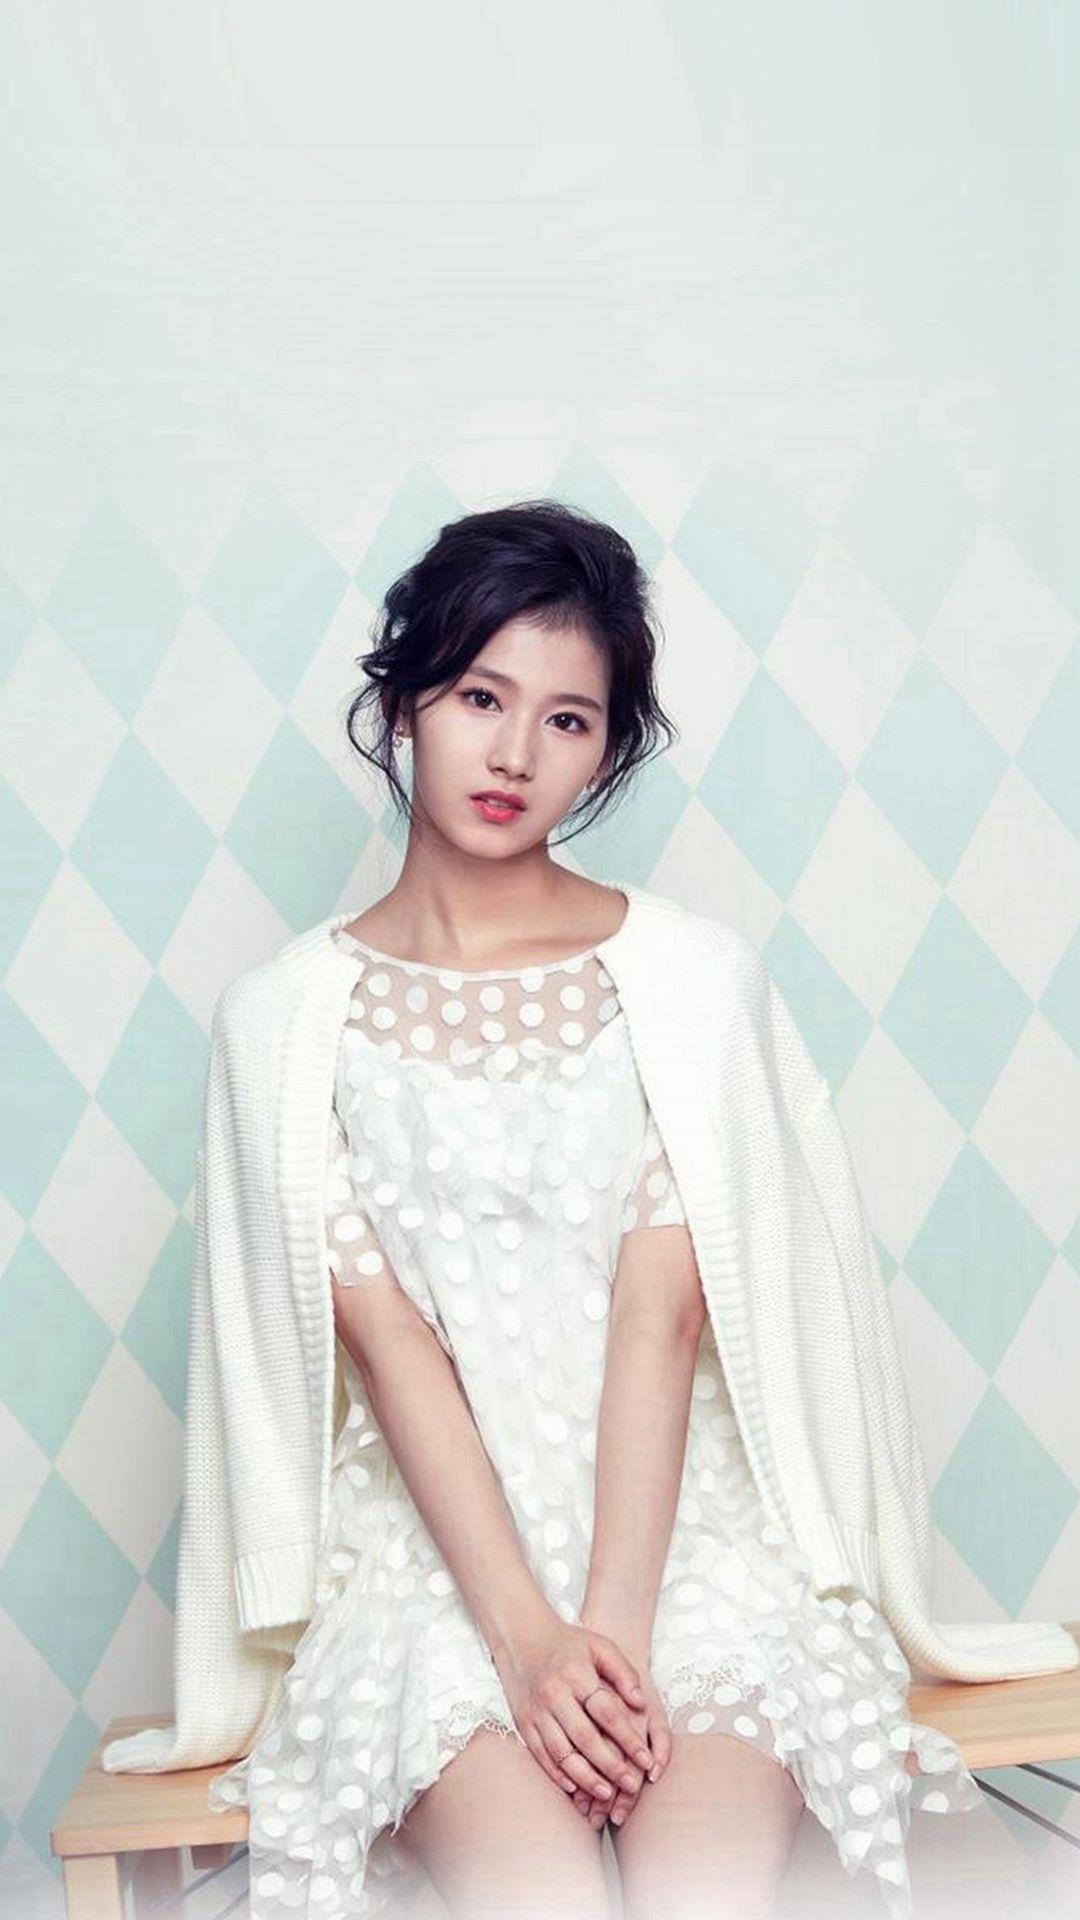 Sana Girl Kpop Twice Iphone 6 Wallpaper Girl Kpop Girls Twice